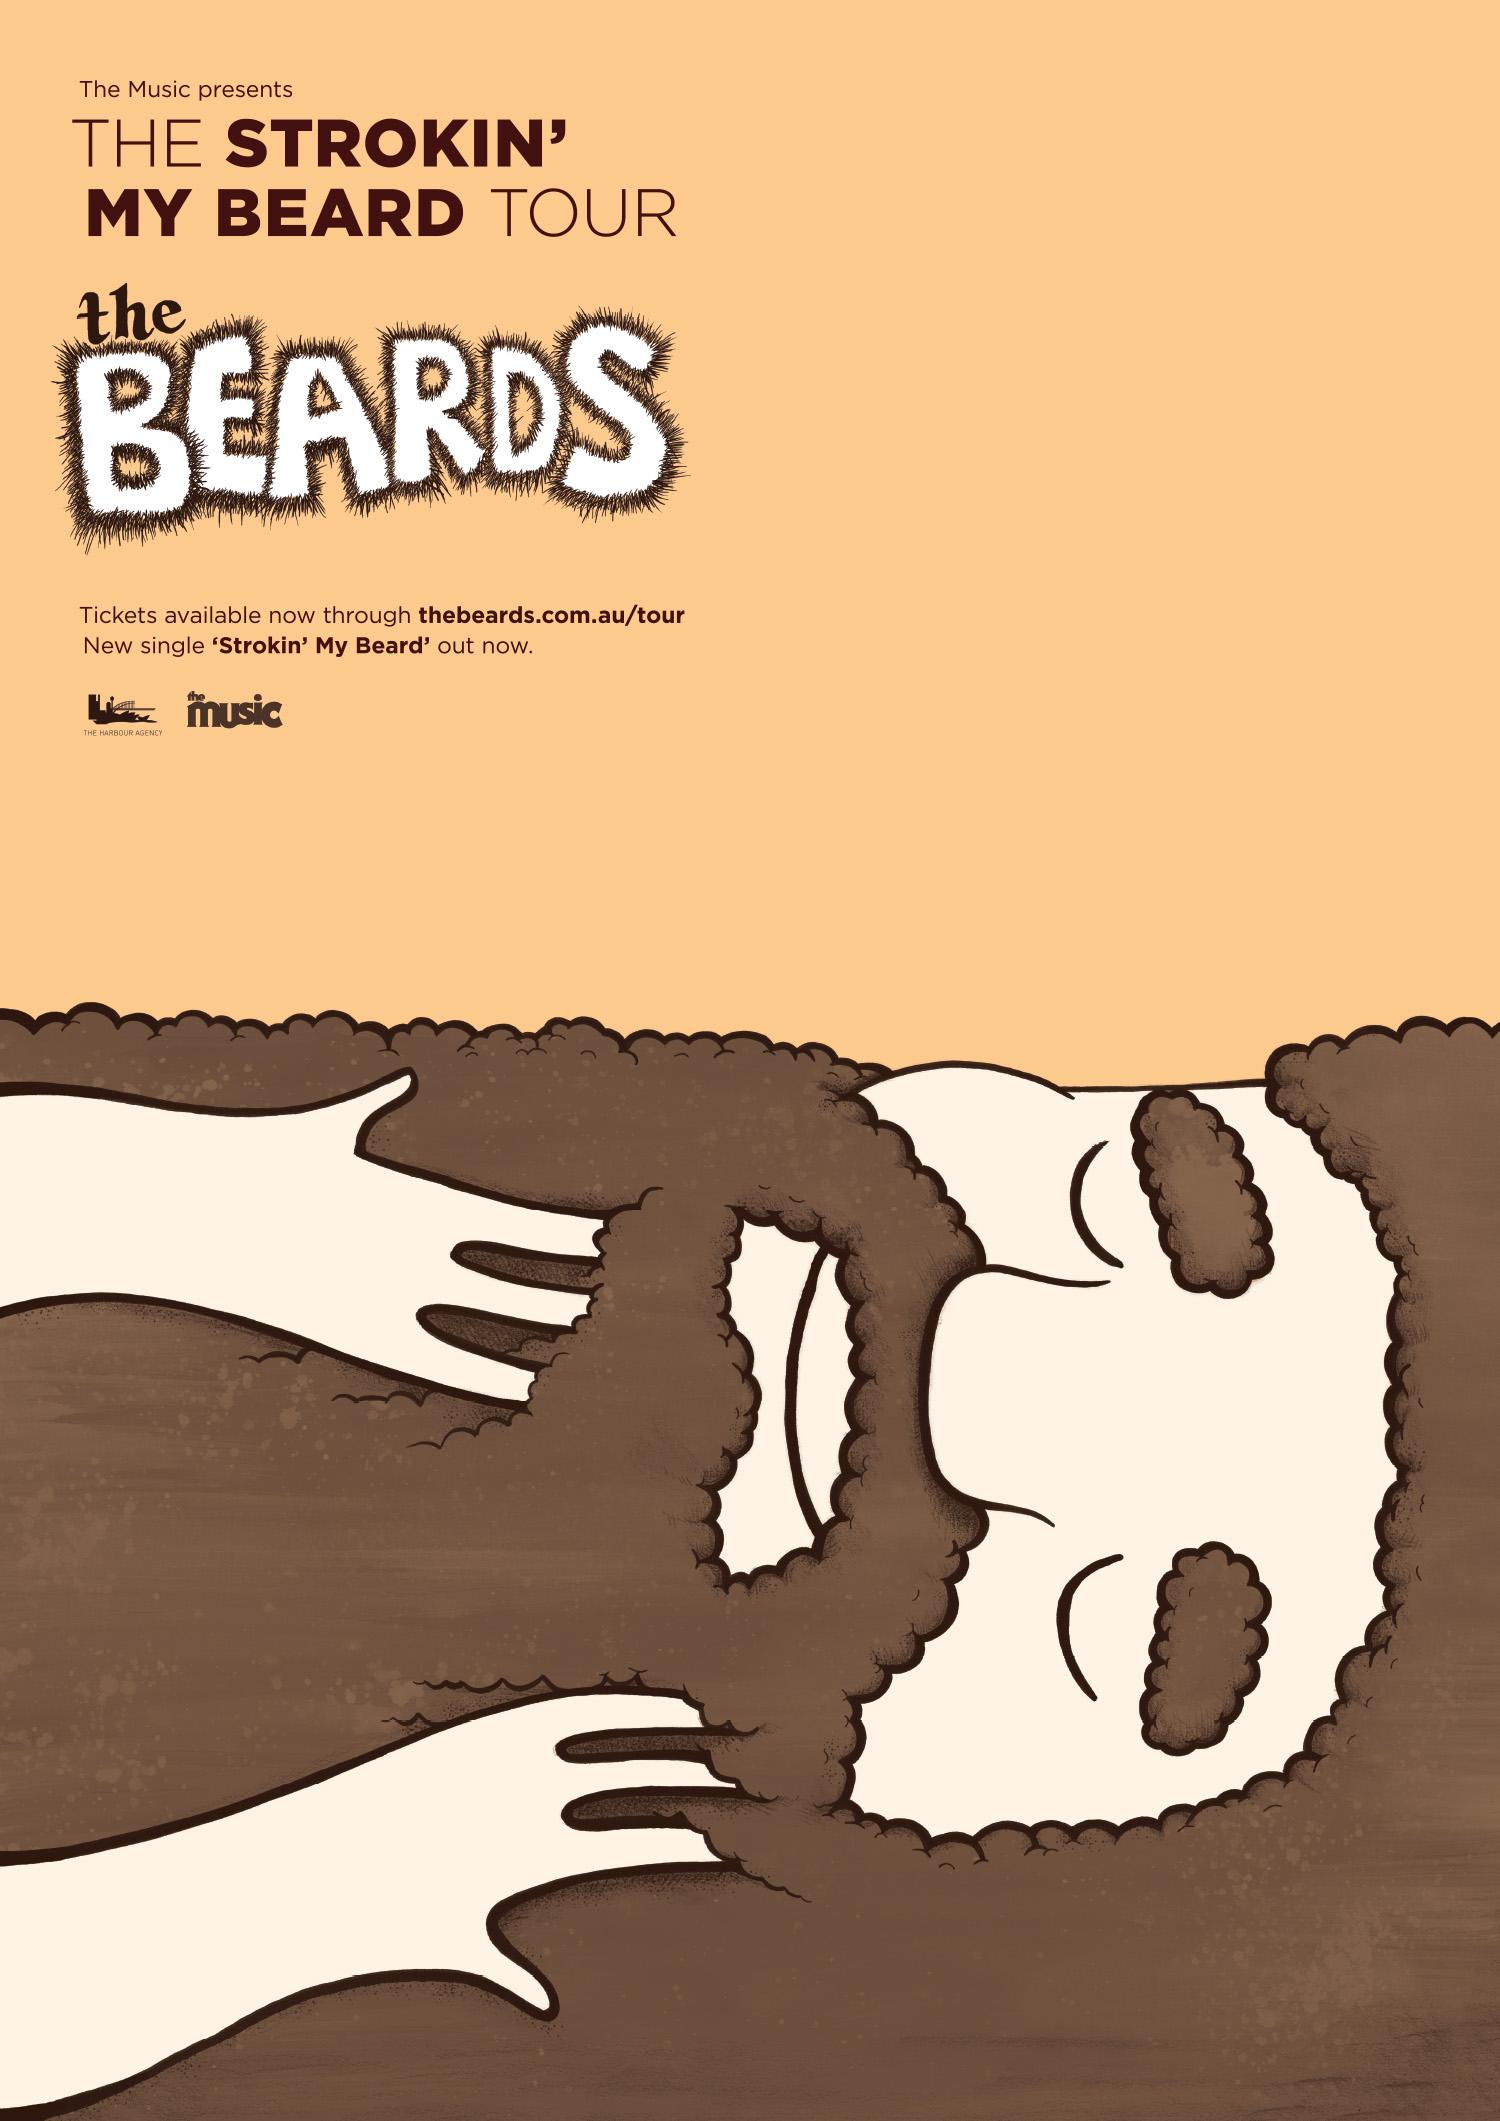 strokin-my-beard-poster-the-beards.jpg